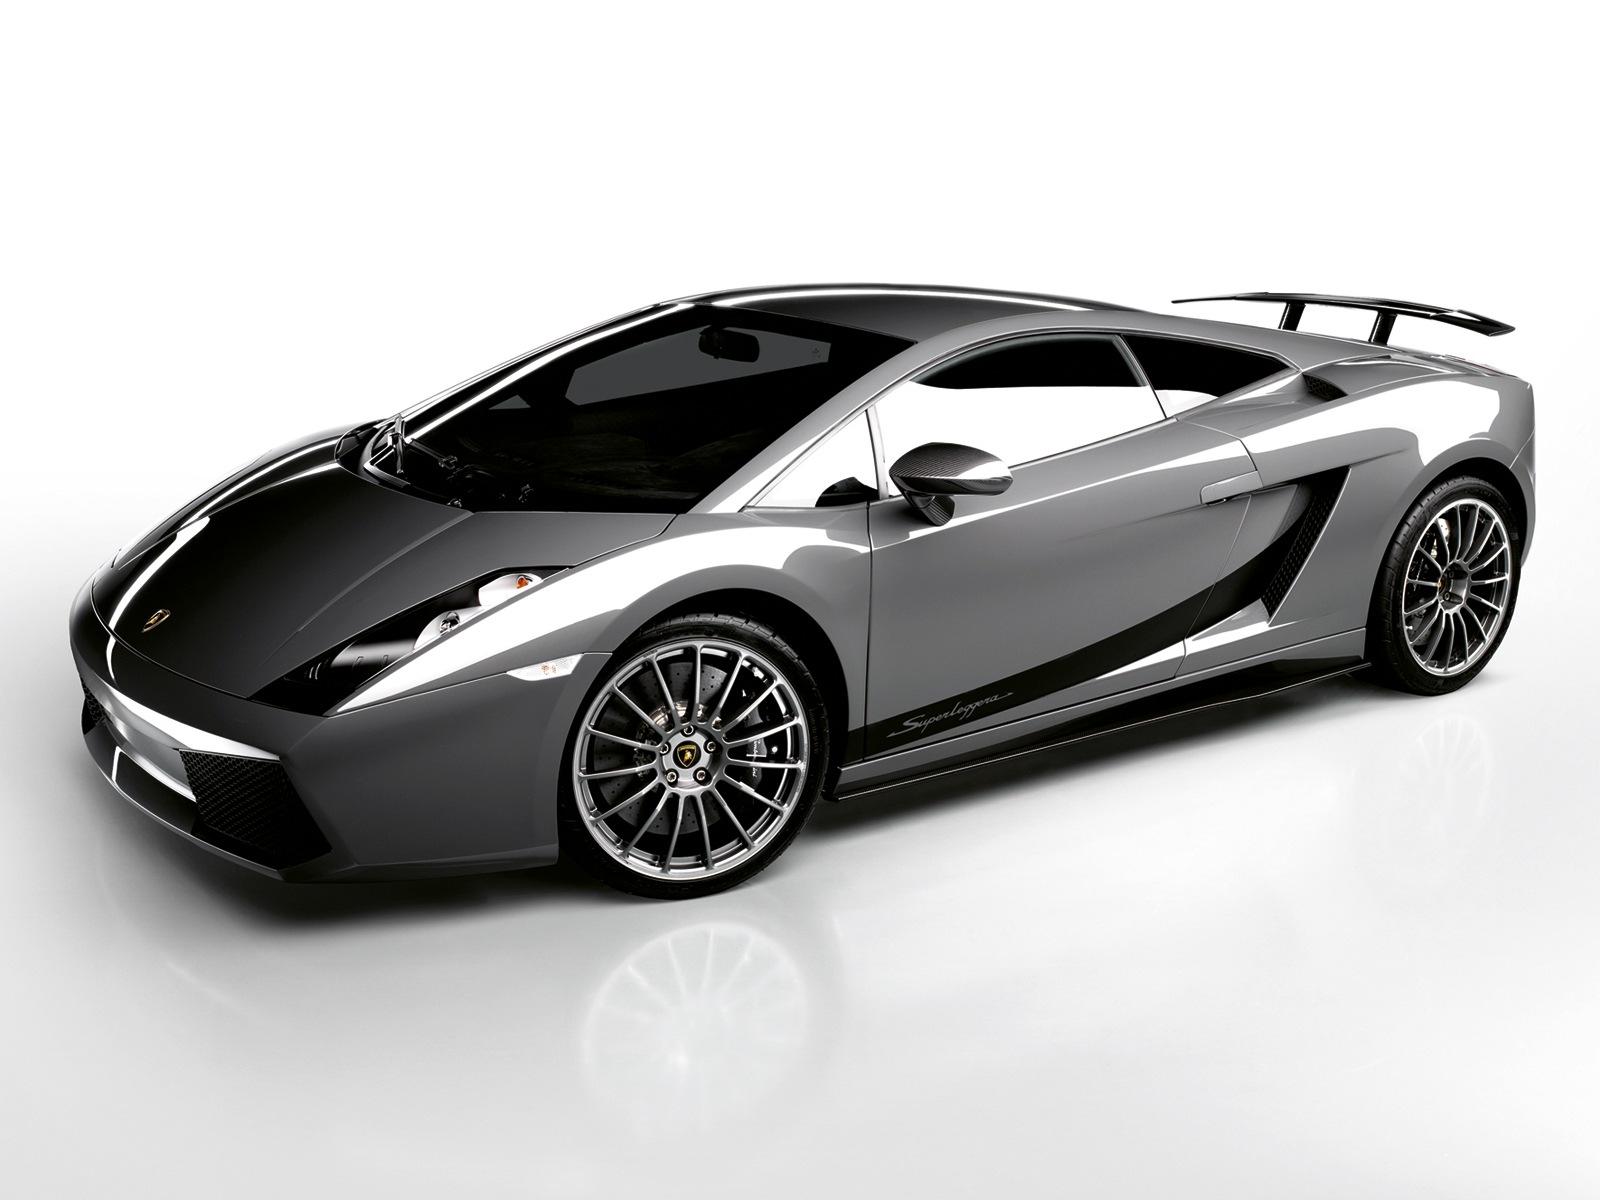 Lamborghini diablo clutches